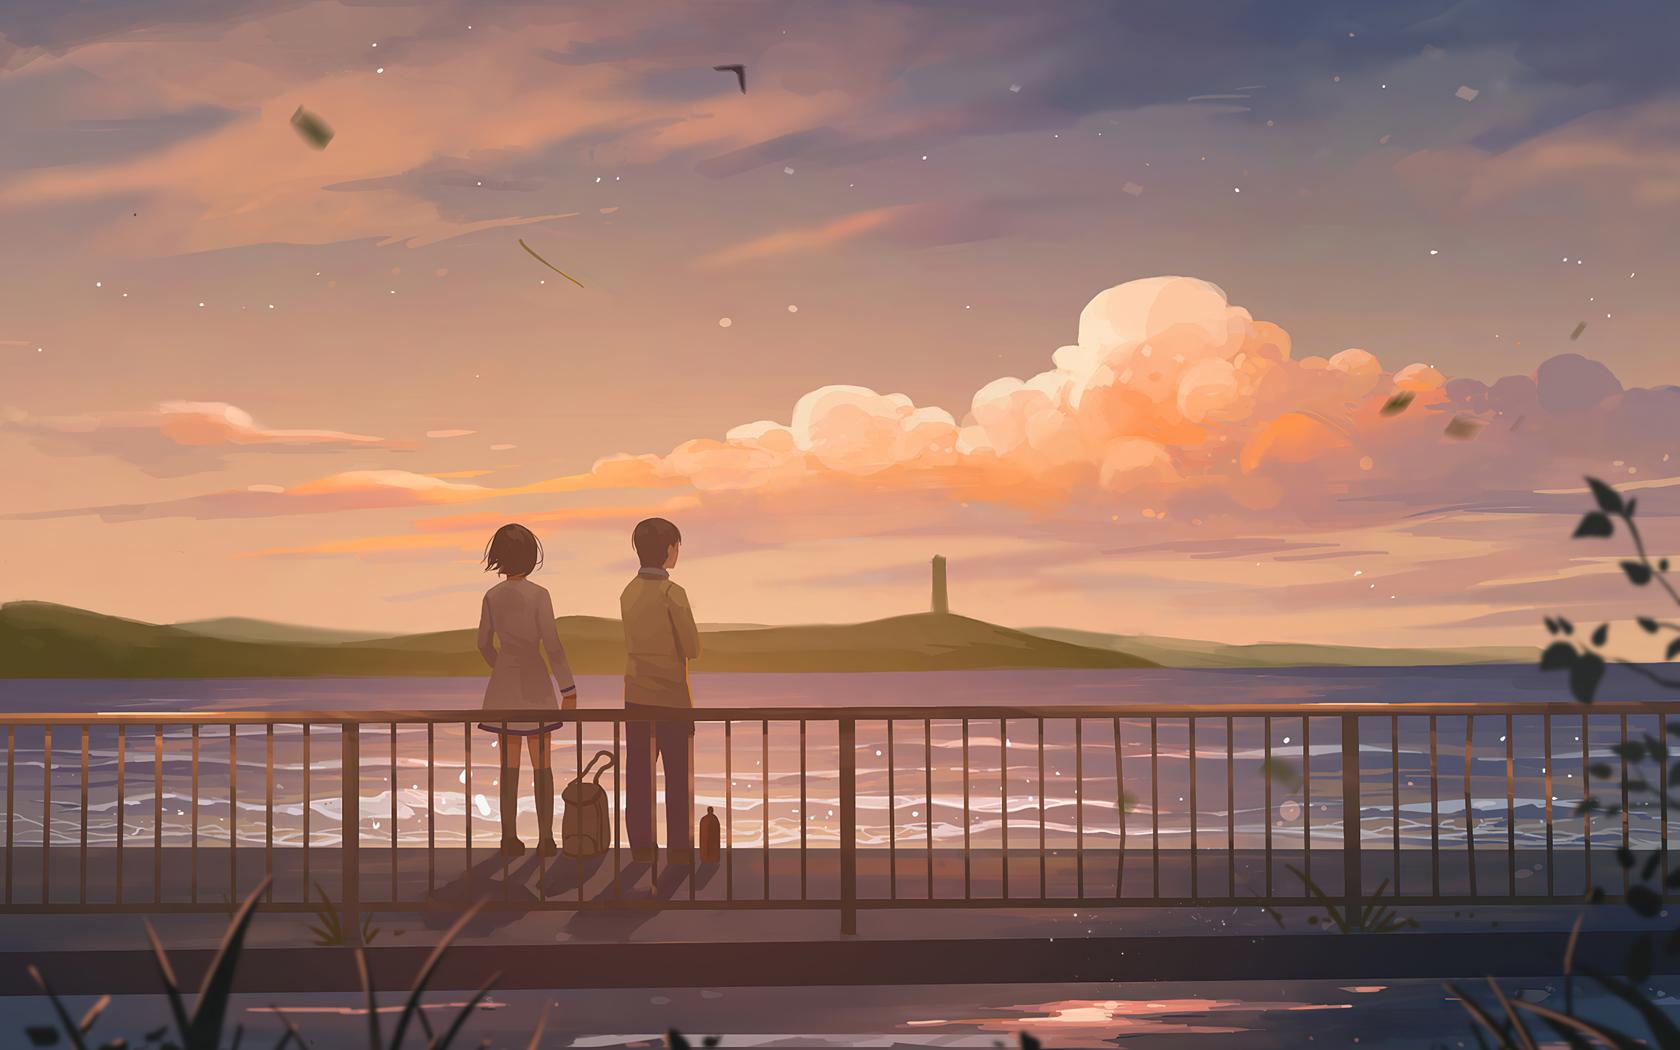 1680x1050 Anime Couple Lets Talk 4k 1680x1050 Resolution ...